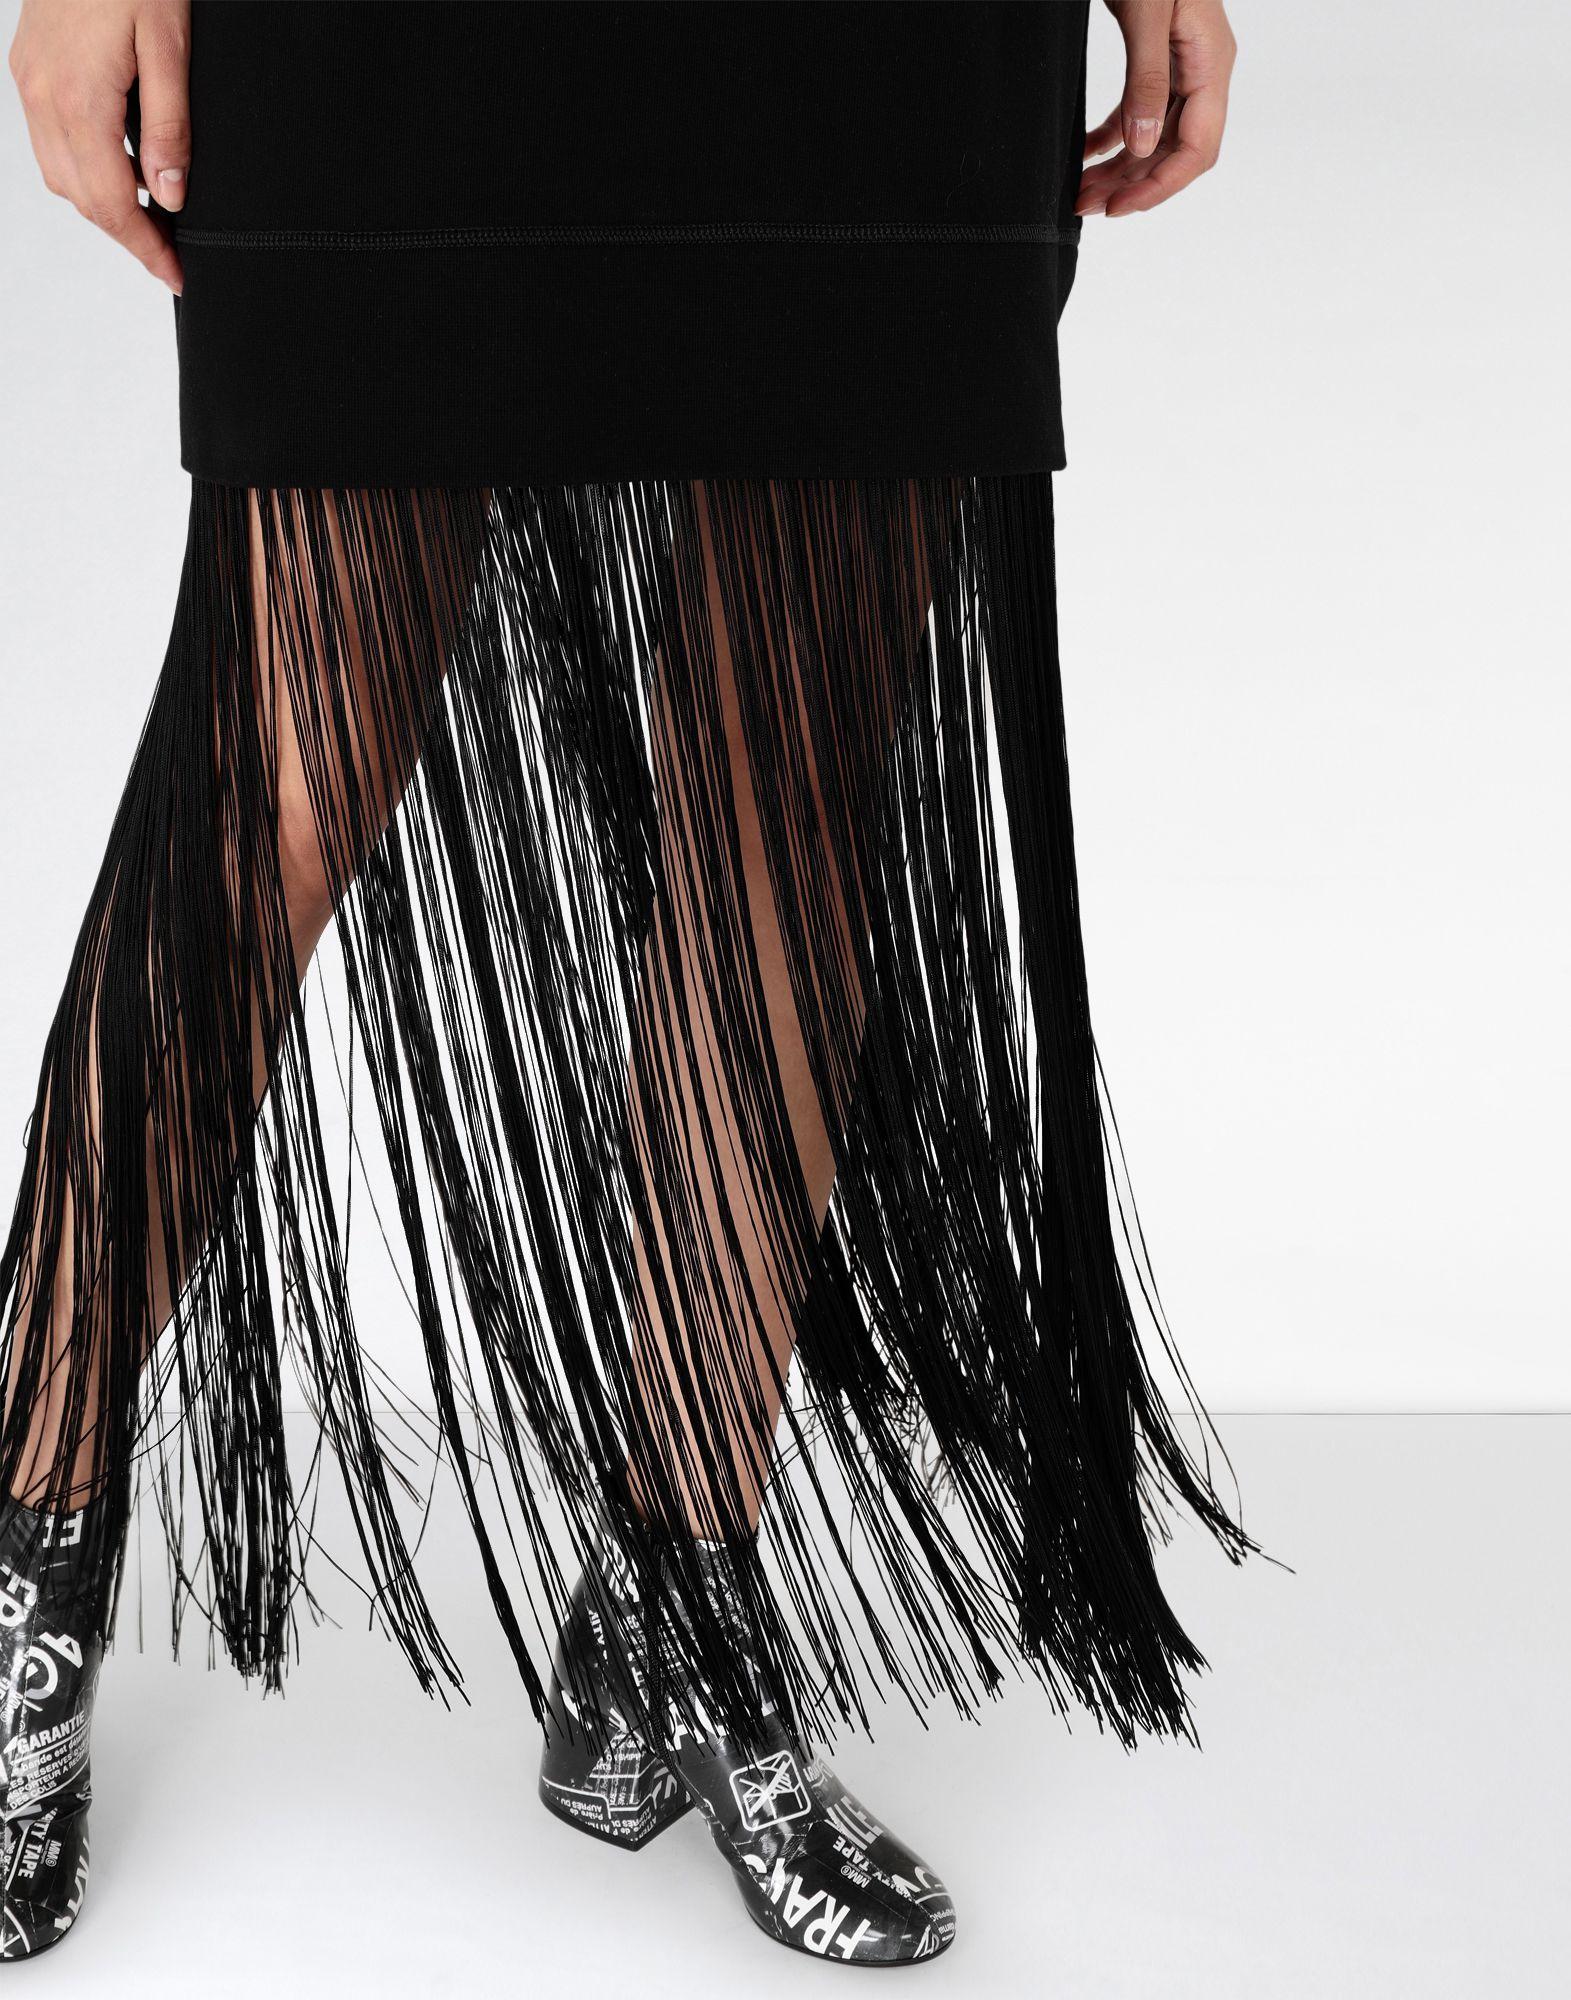 MM6 MAISON MARGIELA Jumper dress with fringes Long dress Woman a